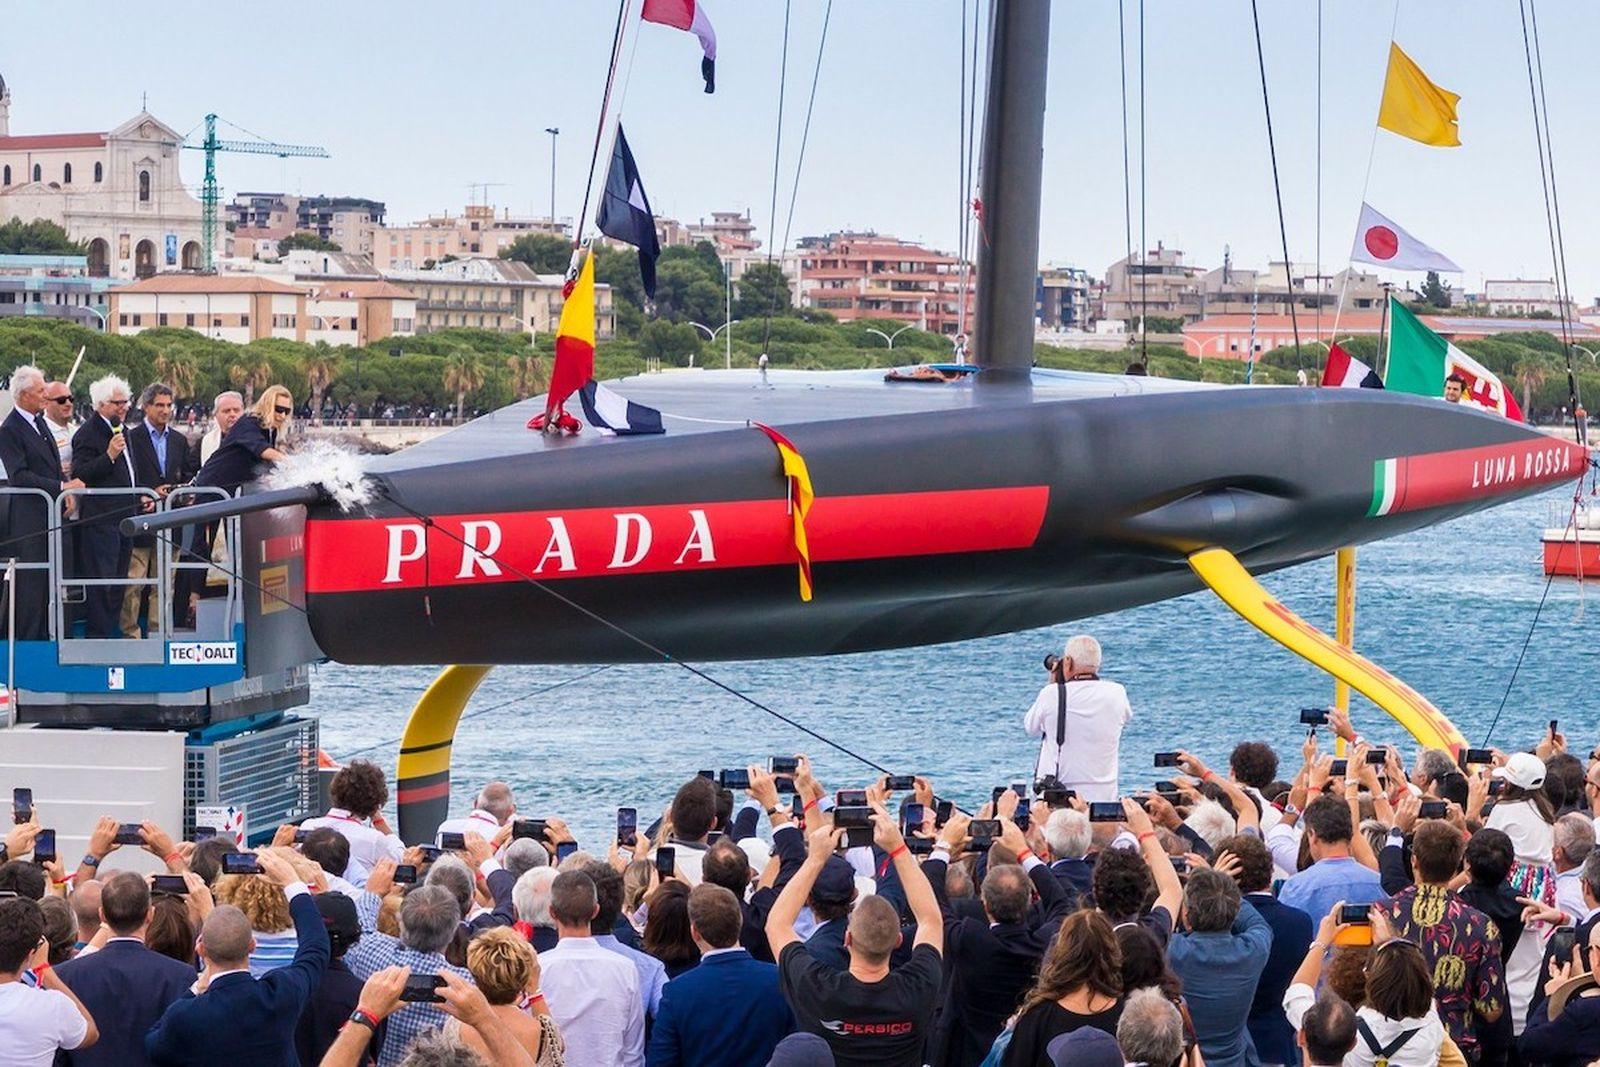 Prada Luna Rossa Boat